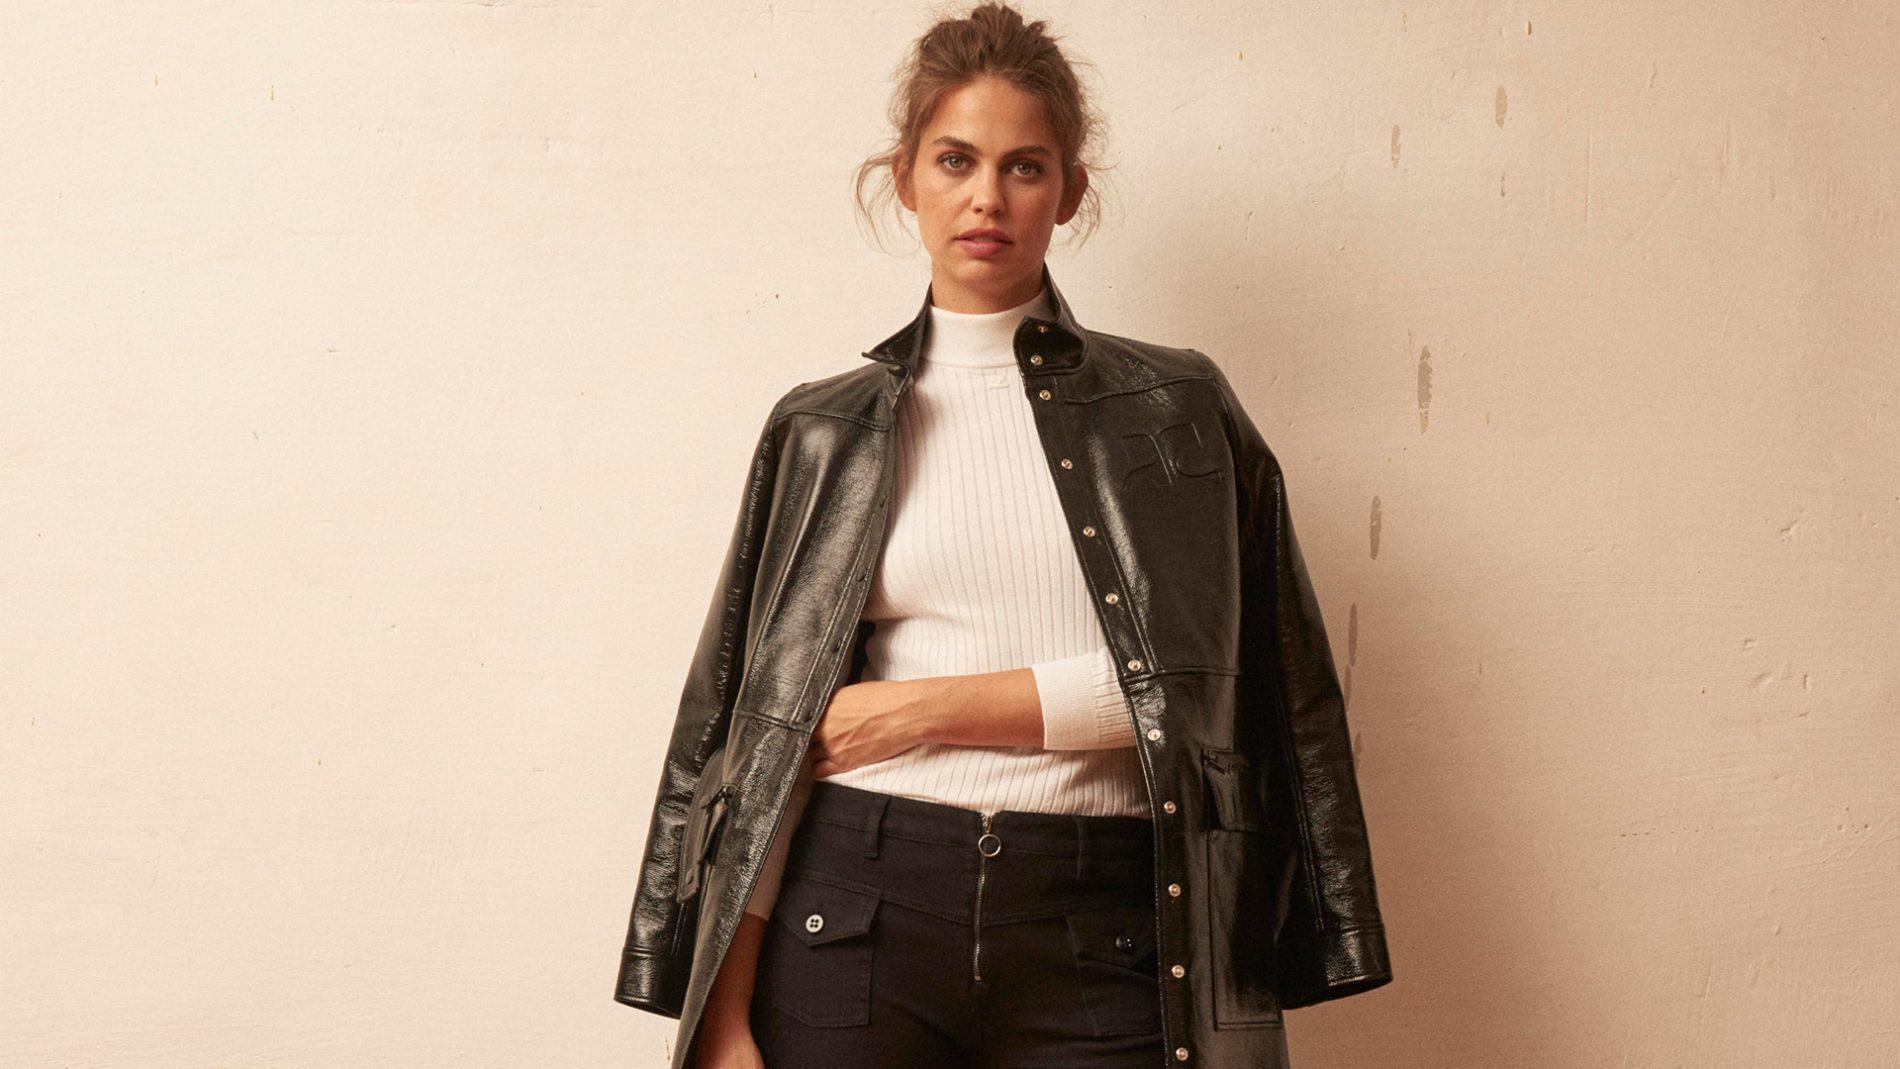 El Corte Inglés Designer Ready-To-Wear Courrèges Victoria Beckham Leather